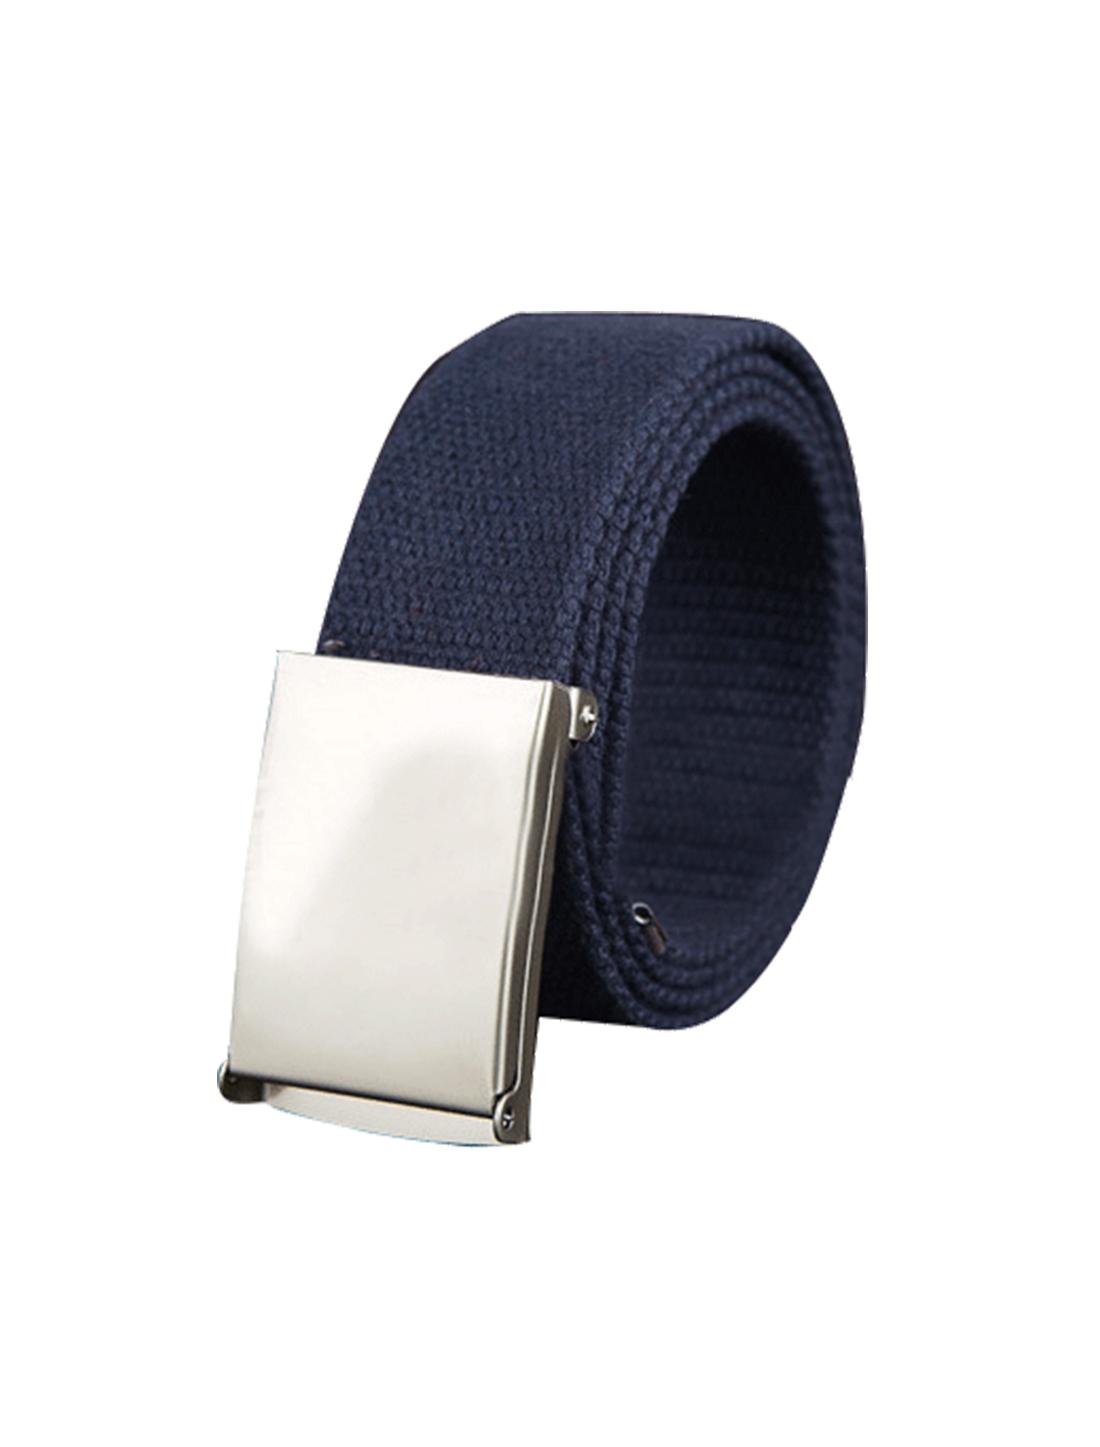 "Unisex Canvas No Hole Slide Metal Buckle Waist Belt Width 1 1/2"" Navy Blue"